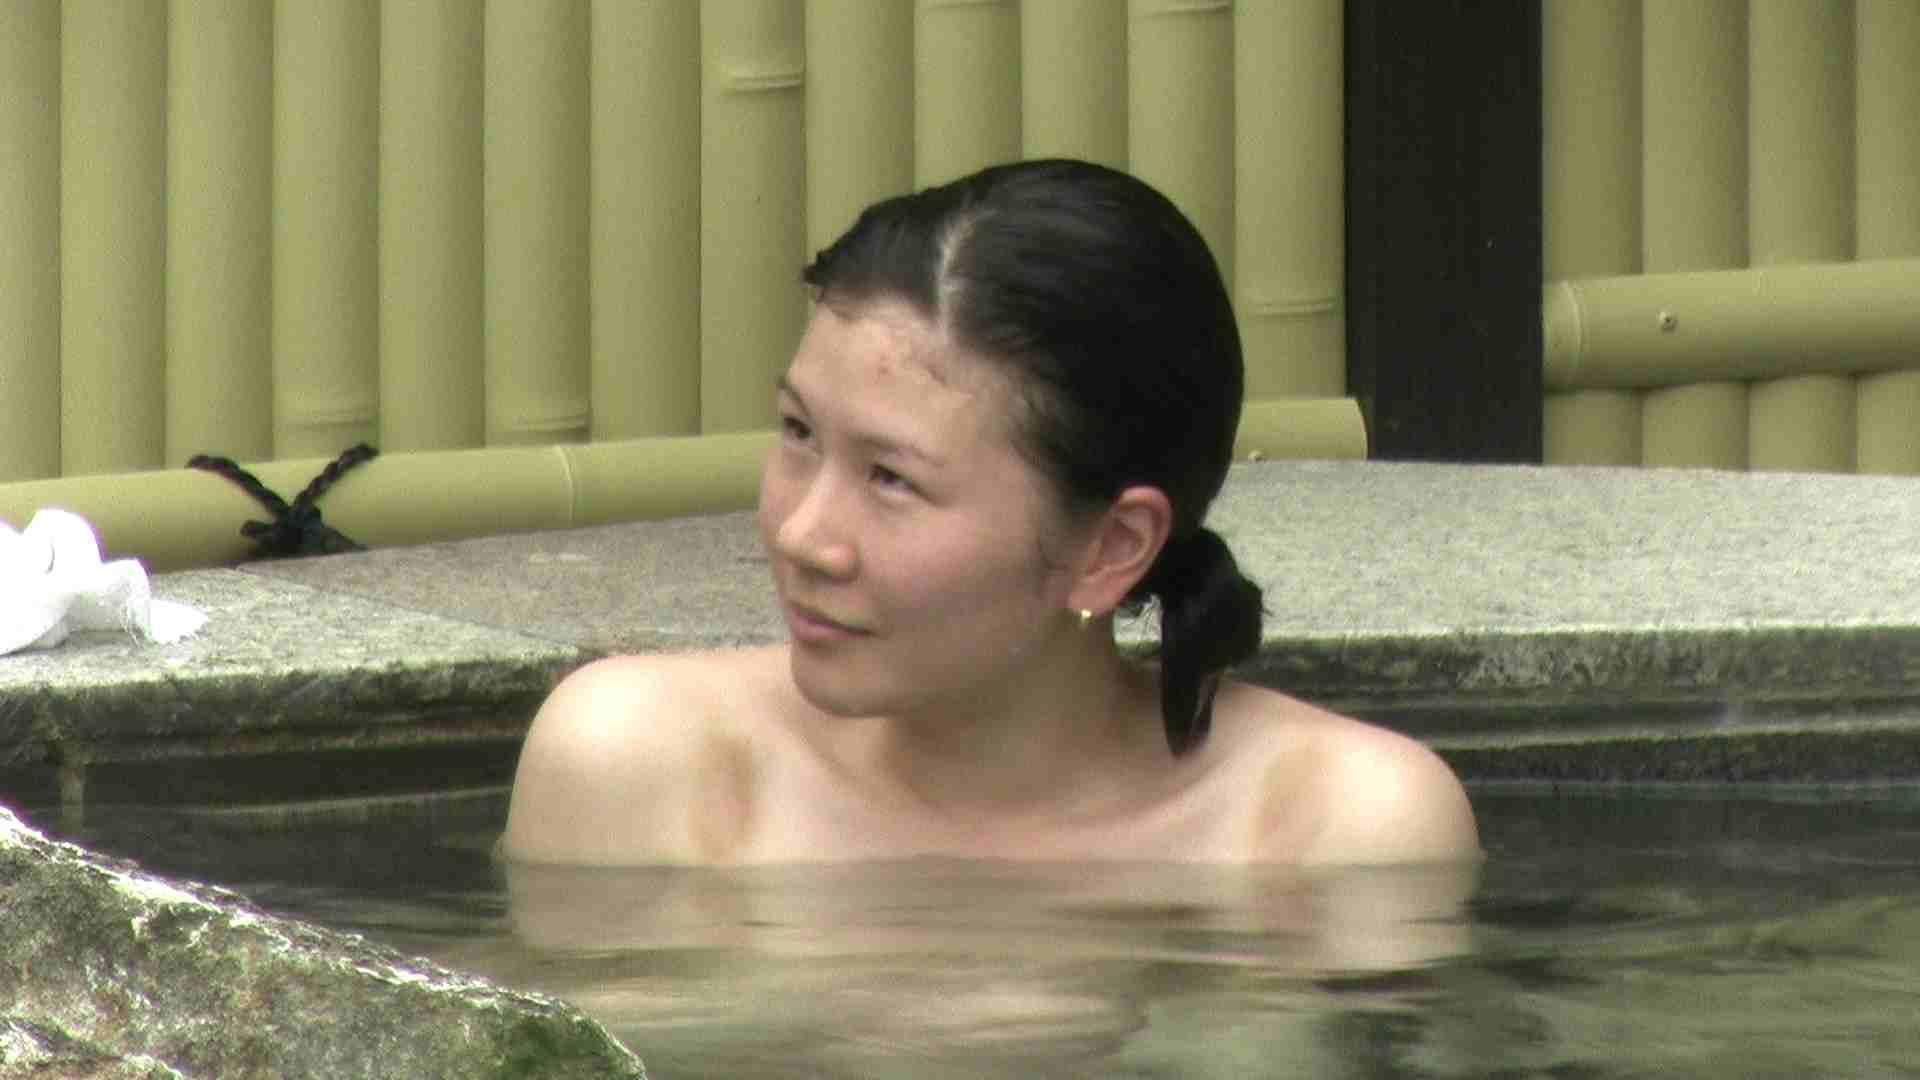 Aquaな露天風呂Vol.187 盗撮映像  99Pix 39